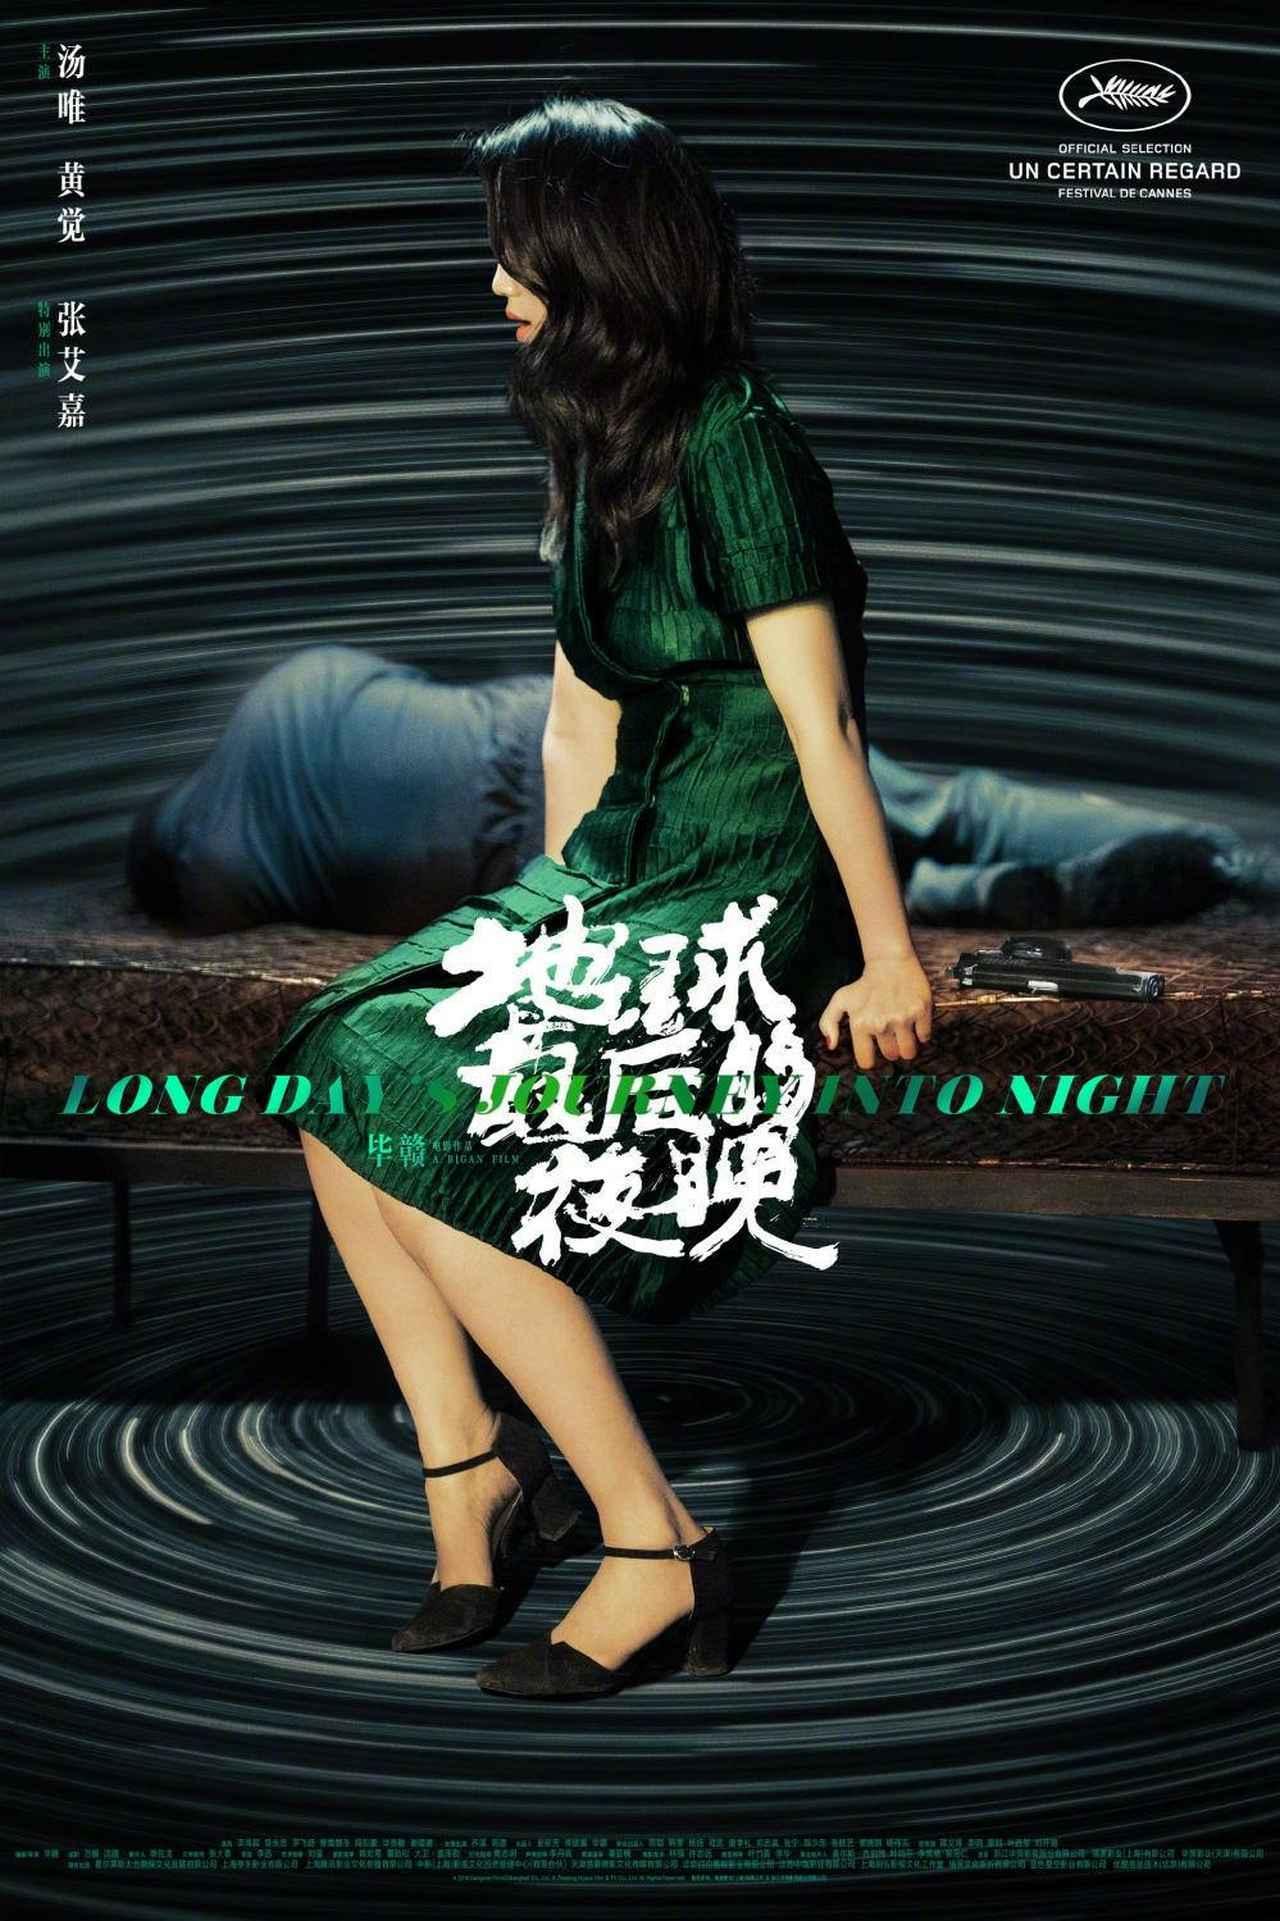 画像3: ©︎2018 Dangmai Films Co., LTD, Zhejiang Huace Film & TV Co., LTD - Wild Bunch / ReallyLikeFilm